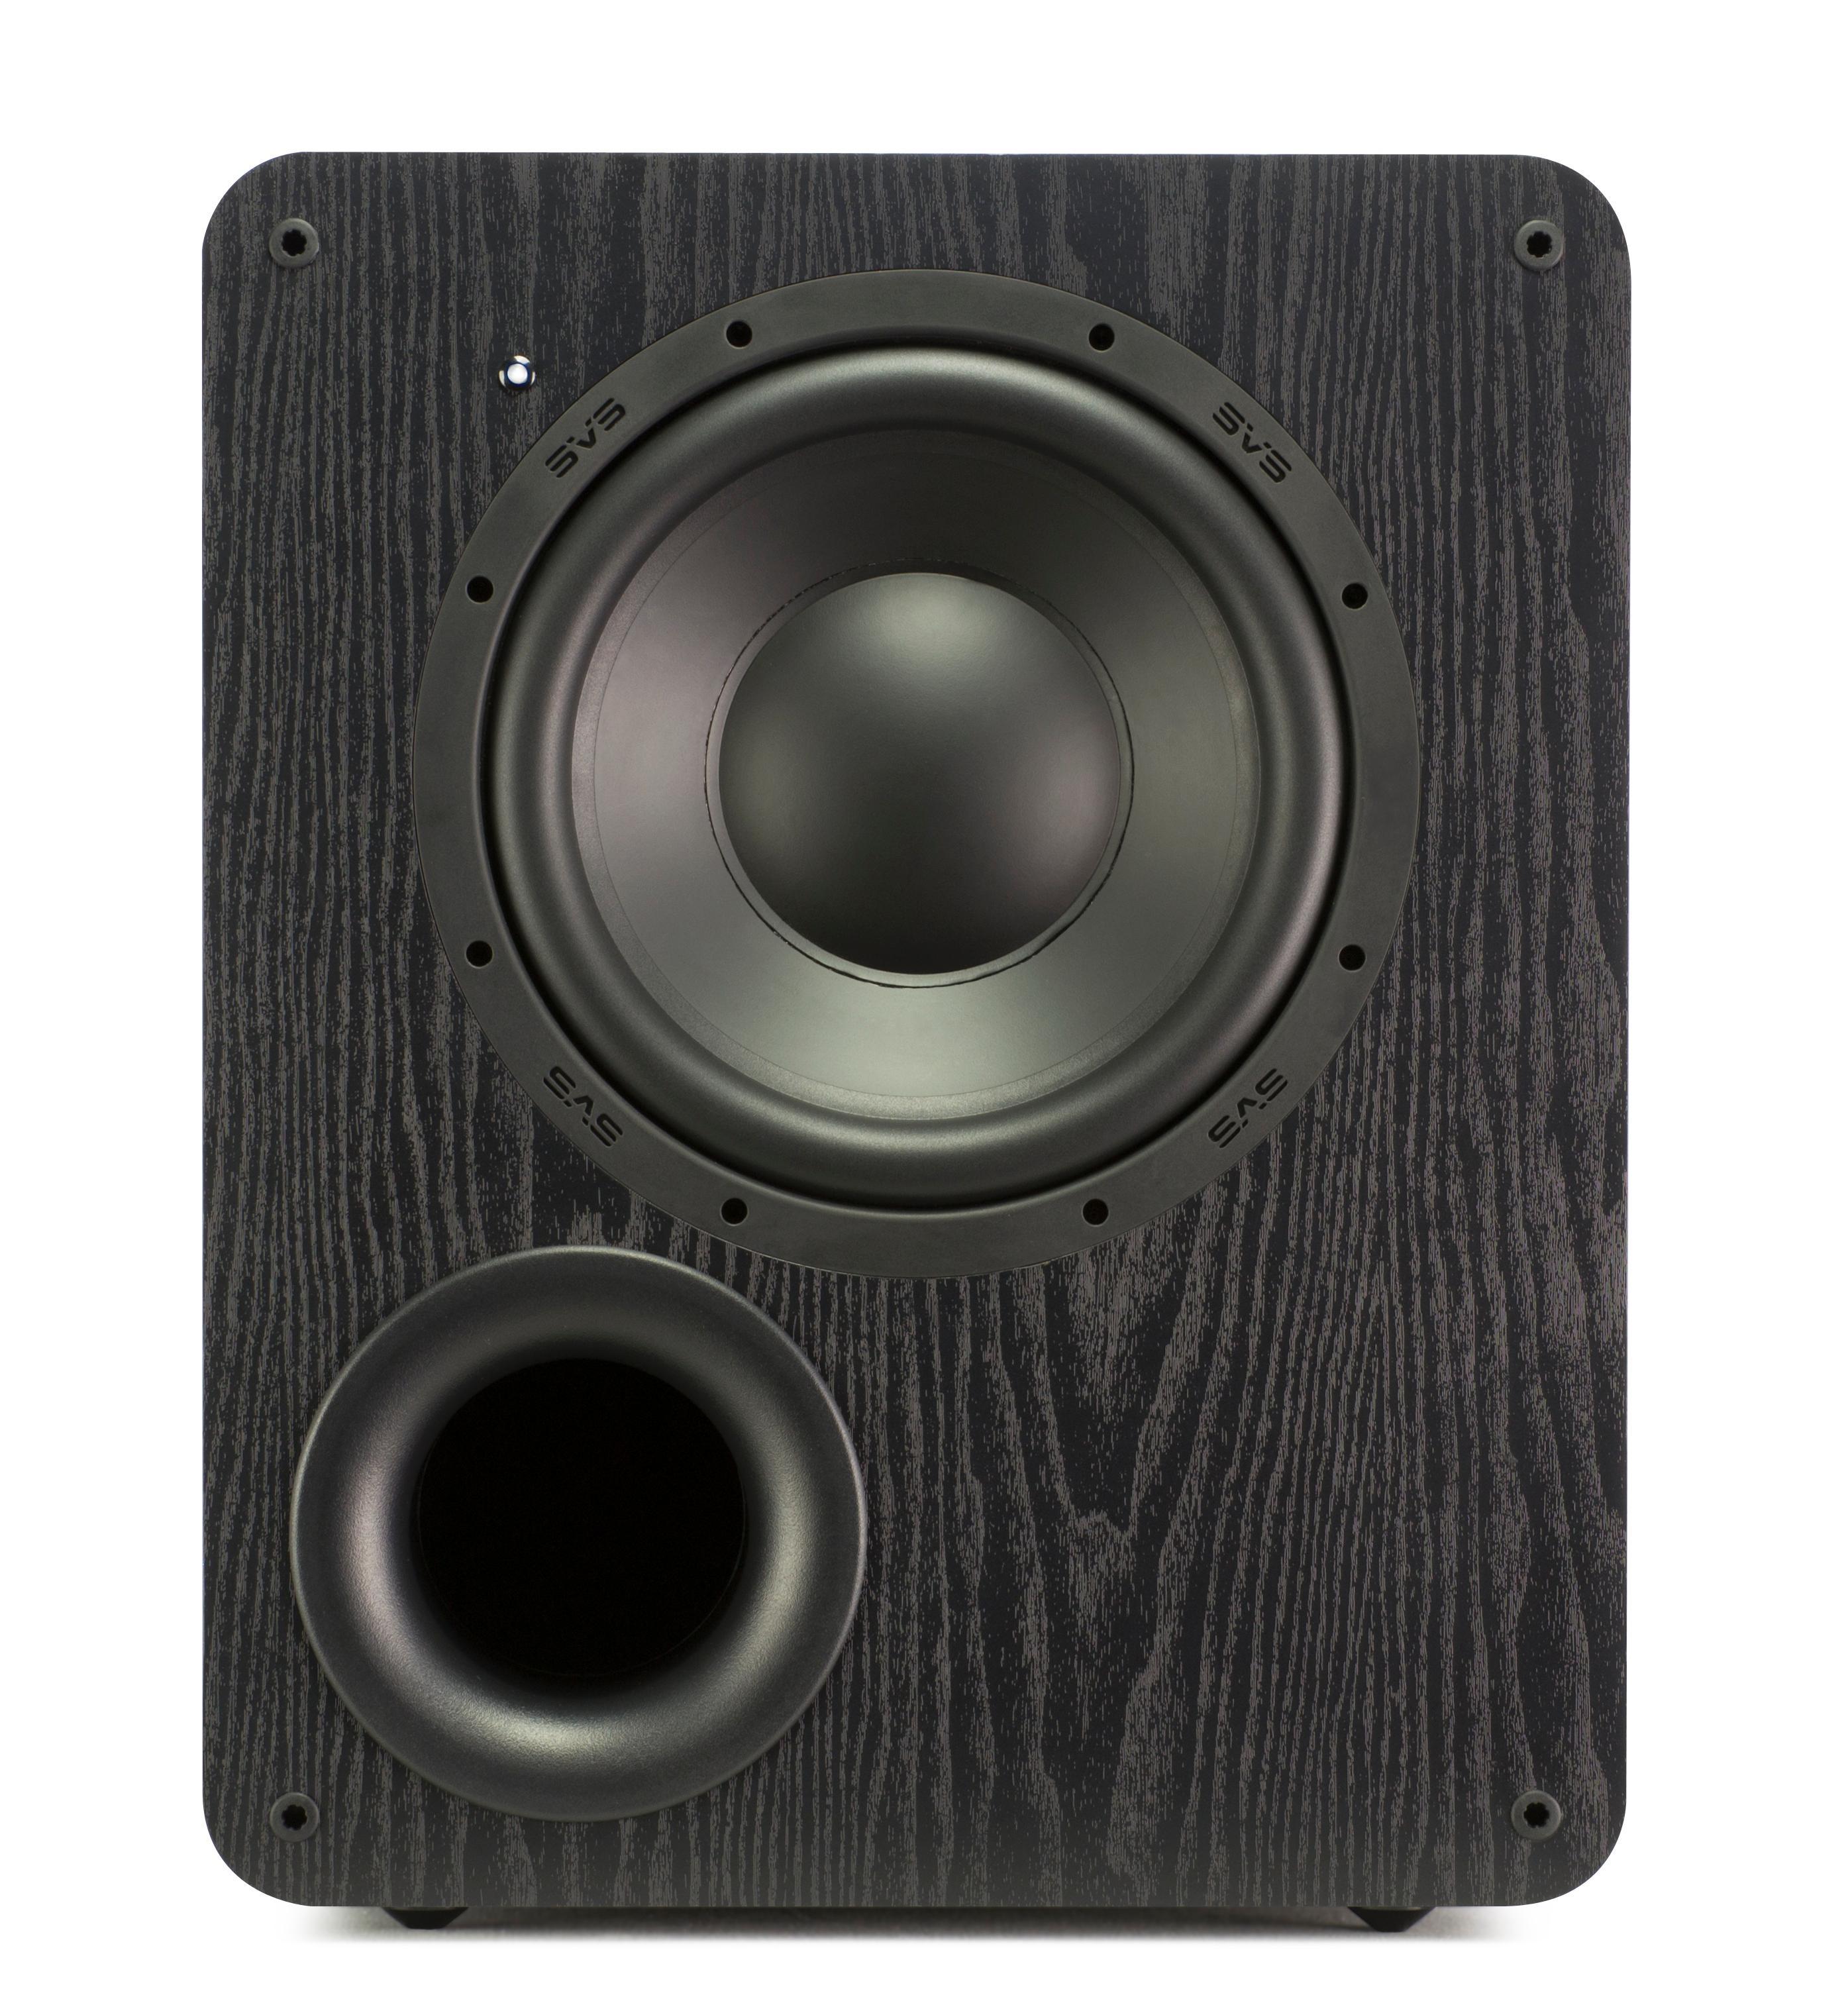 svs pb1000 10 inch 300 watt powered subwoofer home audio theater. Black Bedroom Furniture Sets. Home Design Ideas